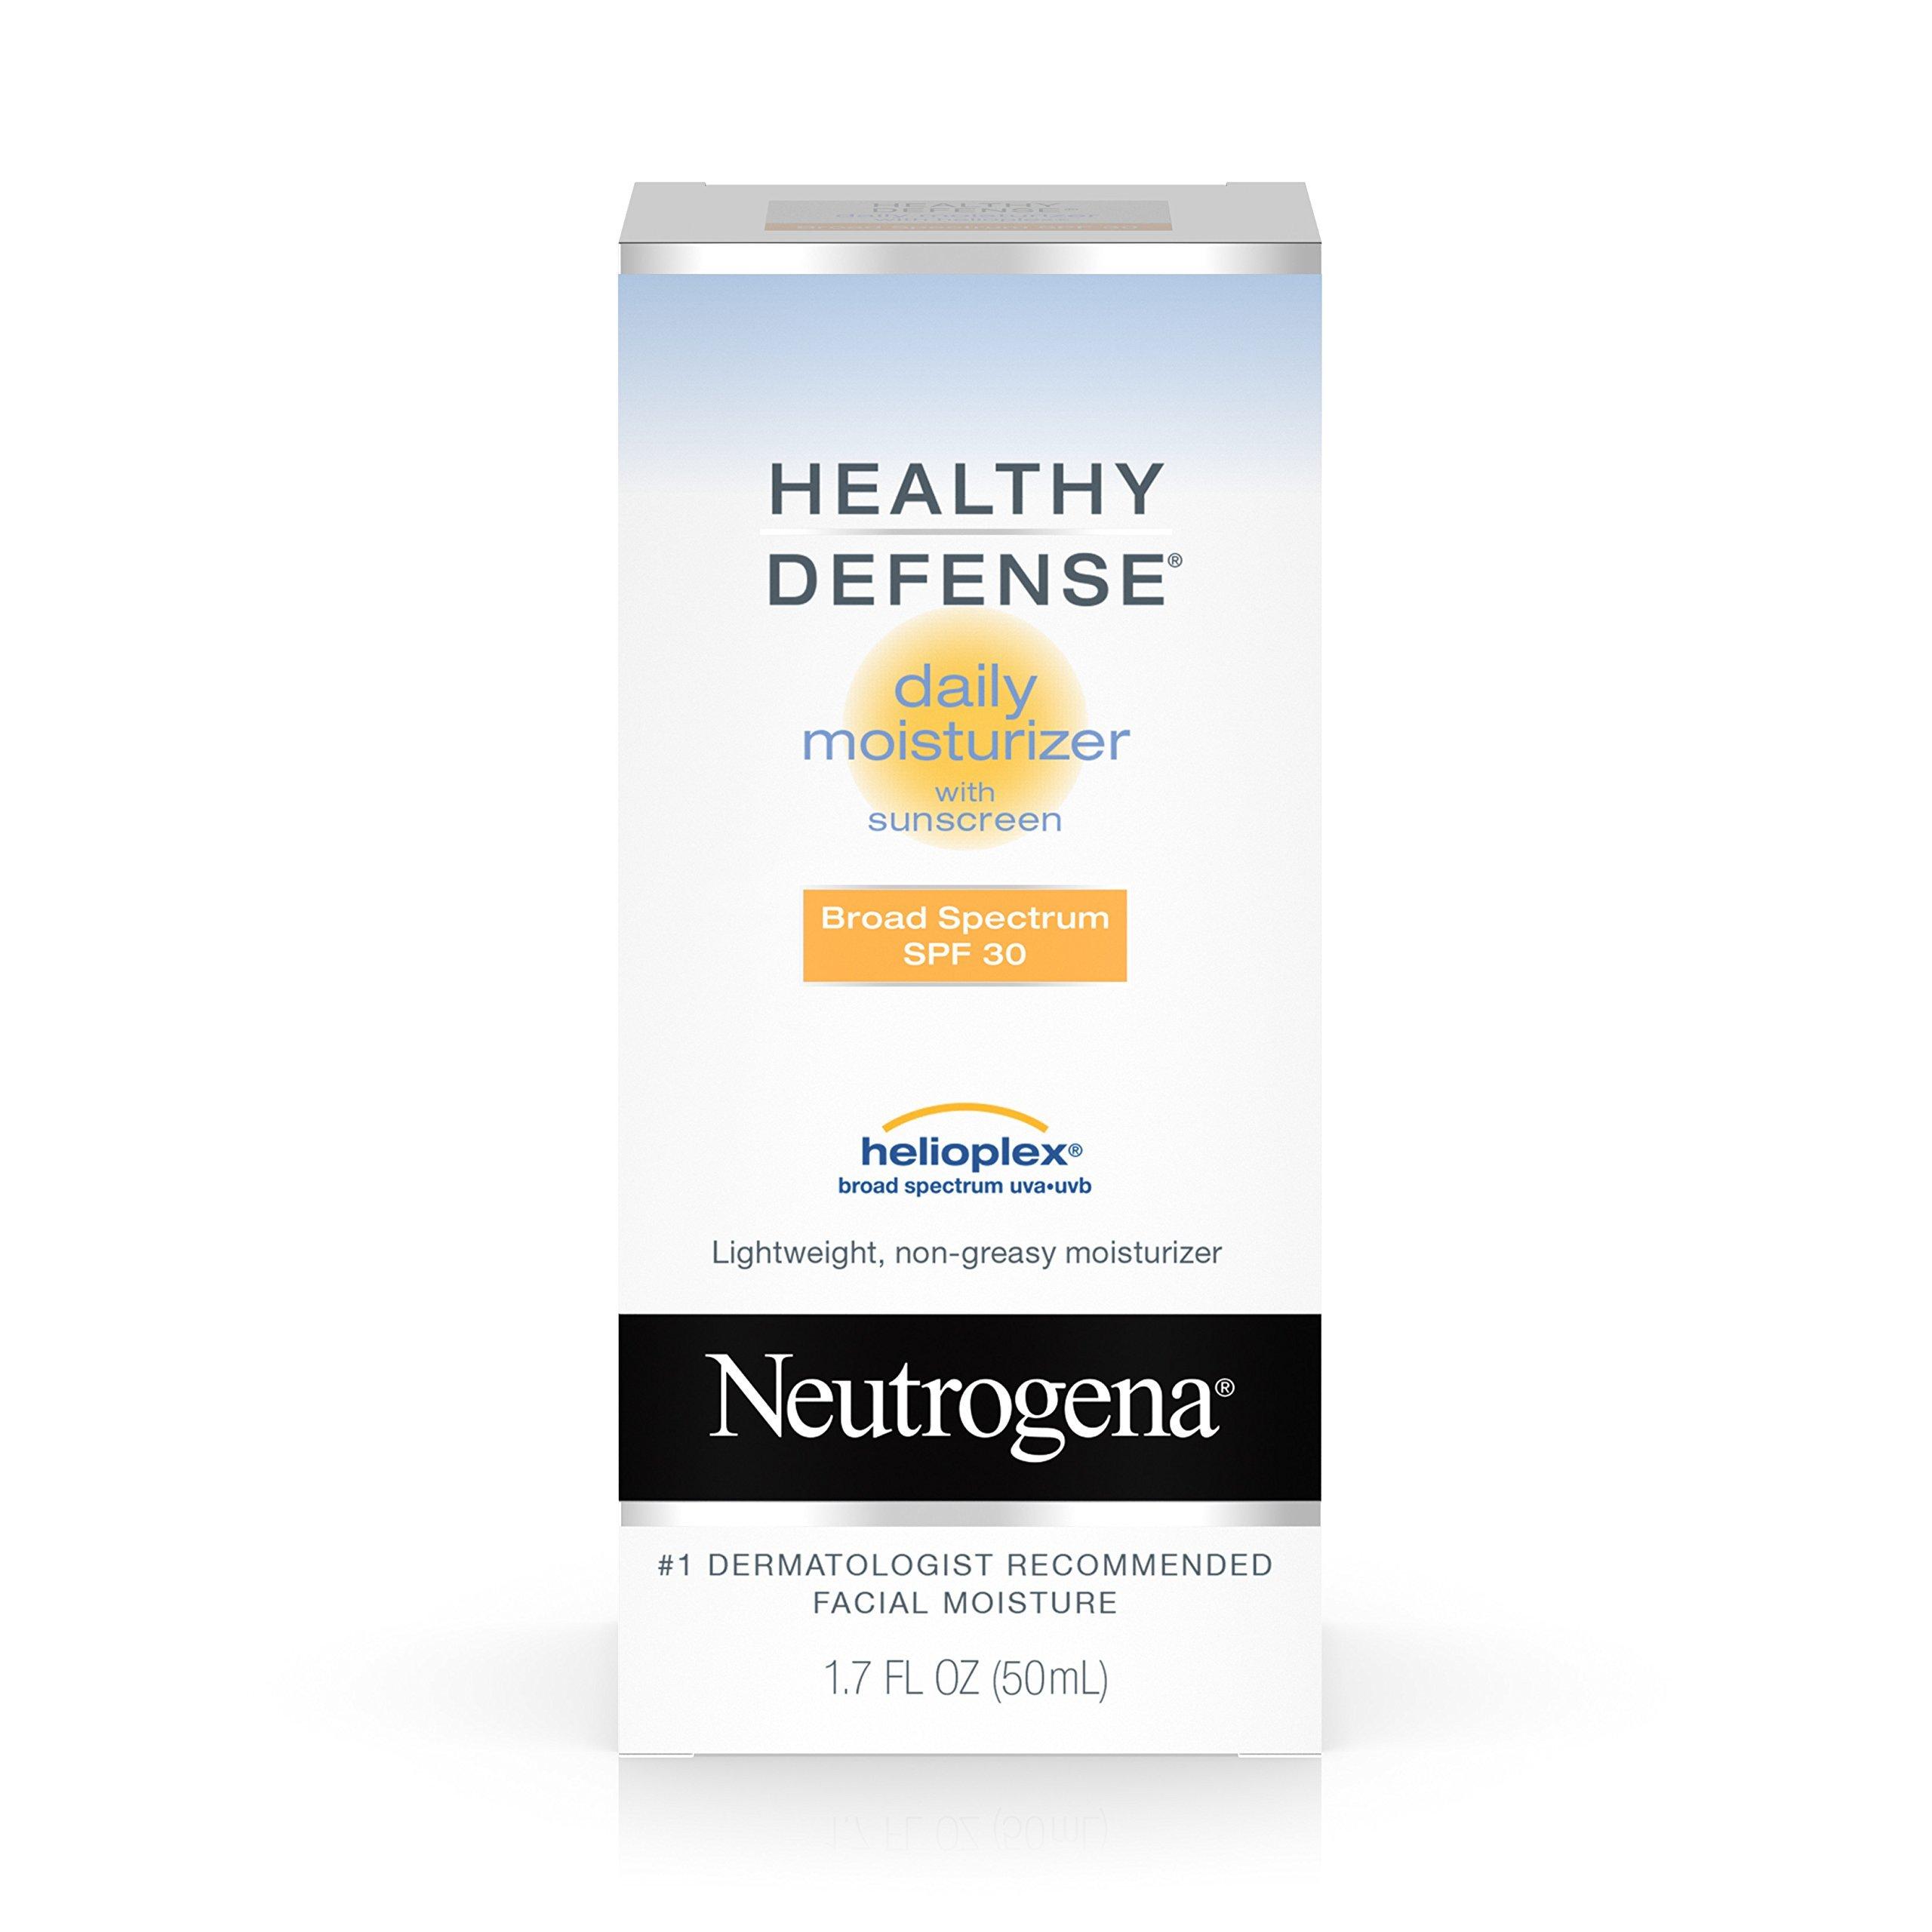 Neutrogena Healthy Defense Daily Moisturizer For Sensitive Skin With Broad Spectrum Spf 30 Sunscreen, 1.7 Fl. Oz.